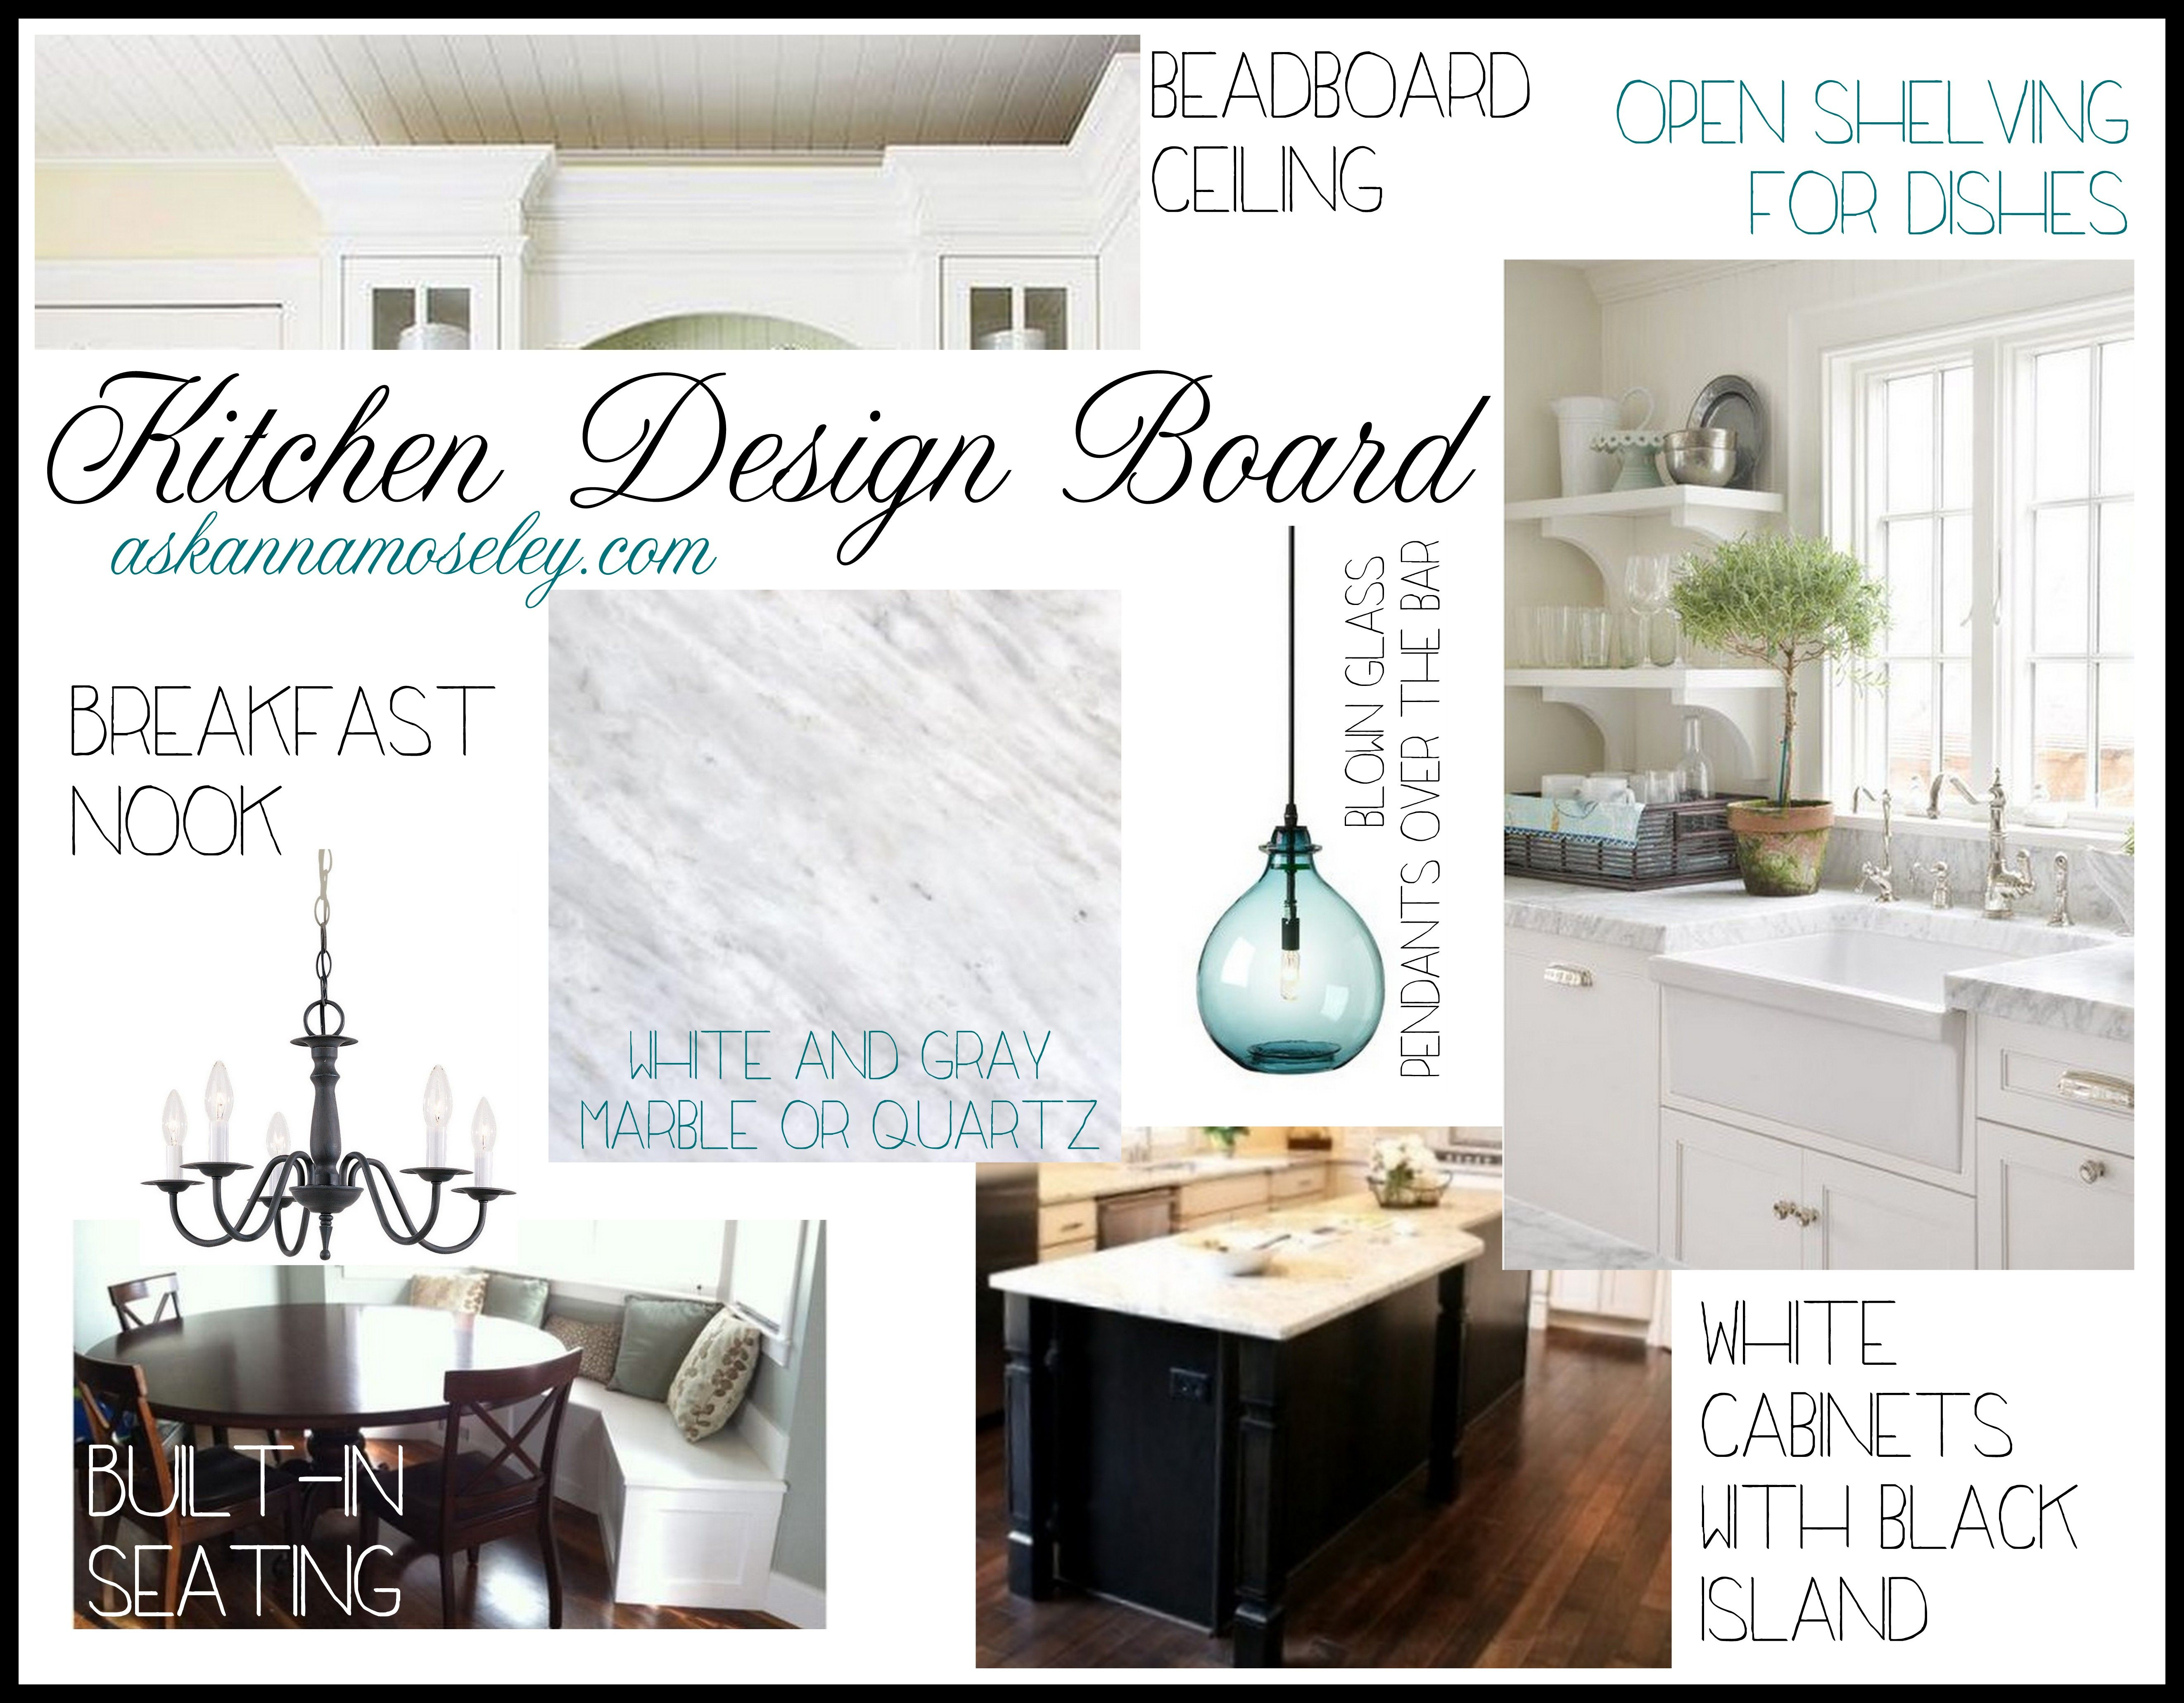 New Kitchen Design Board Ask Anna Farmhouse Kitchen Interior